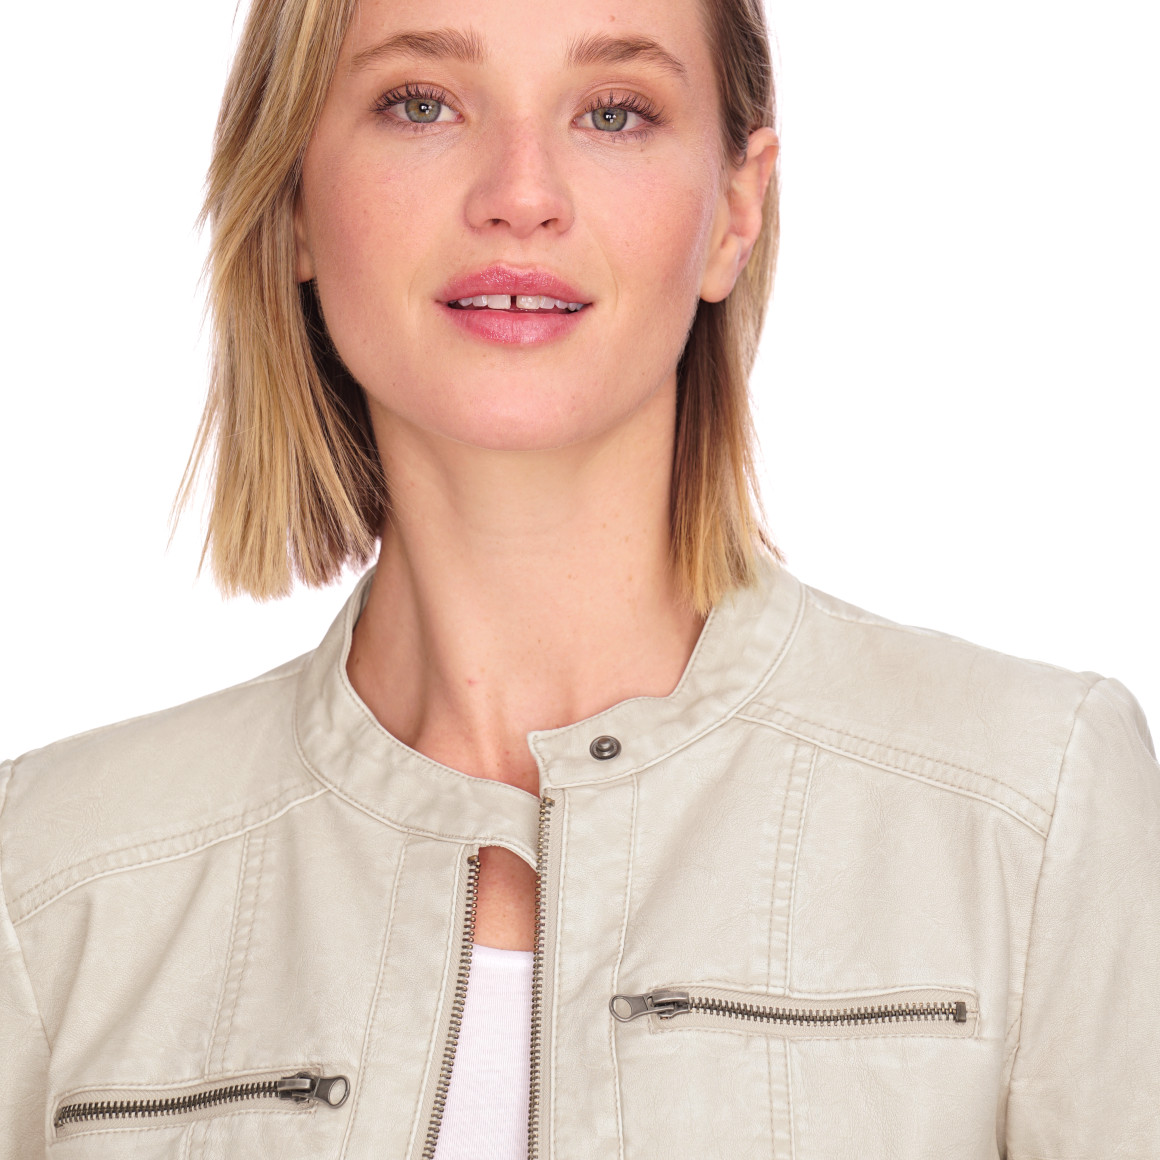 Damen Lederimitatjacke mit Reißverschluss | Ernsting's family